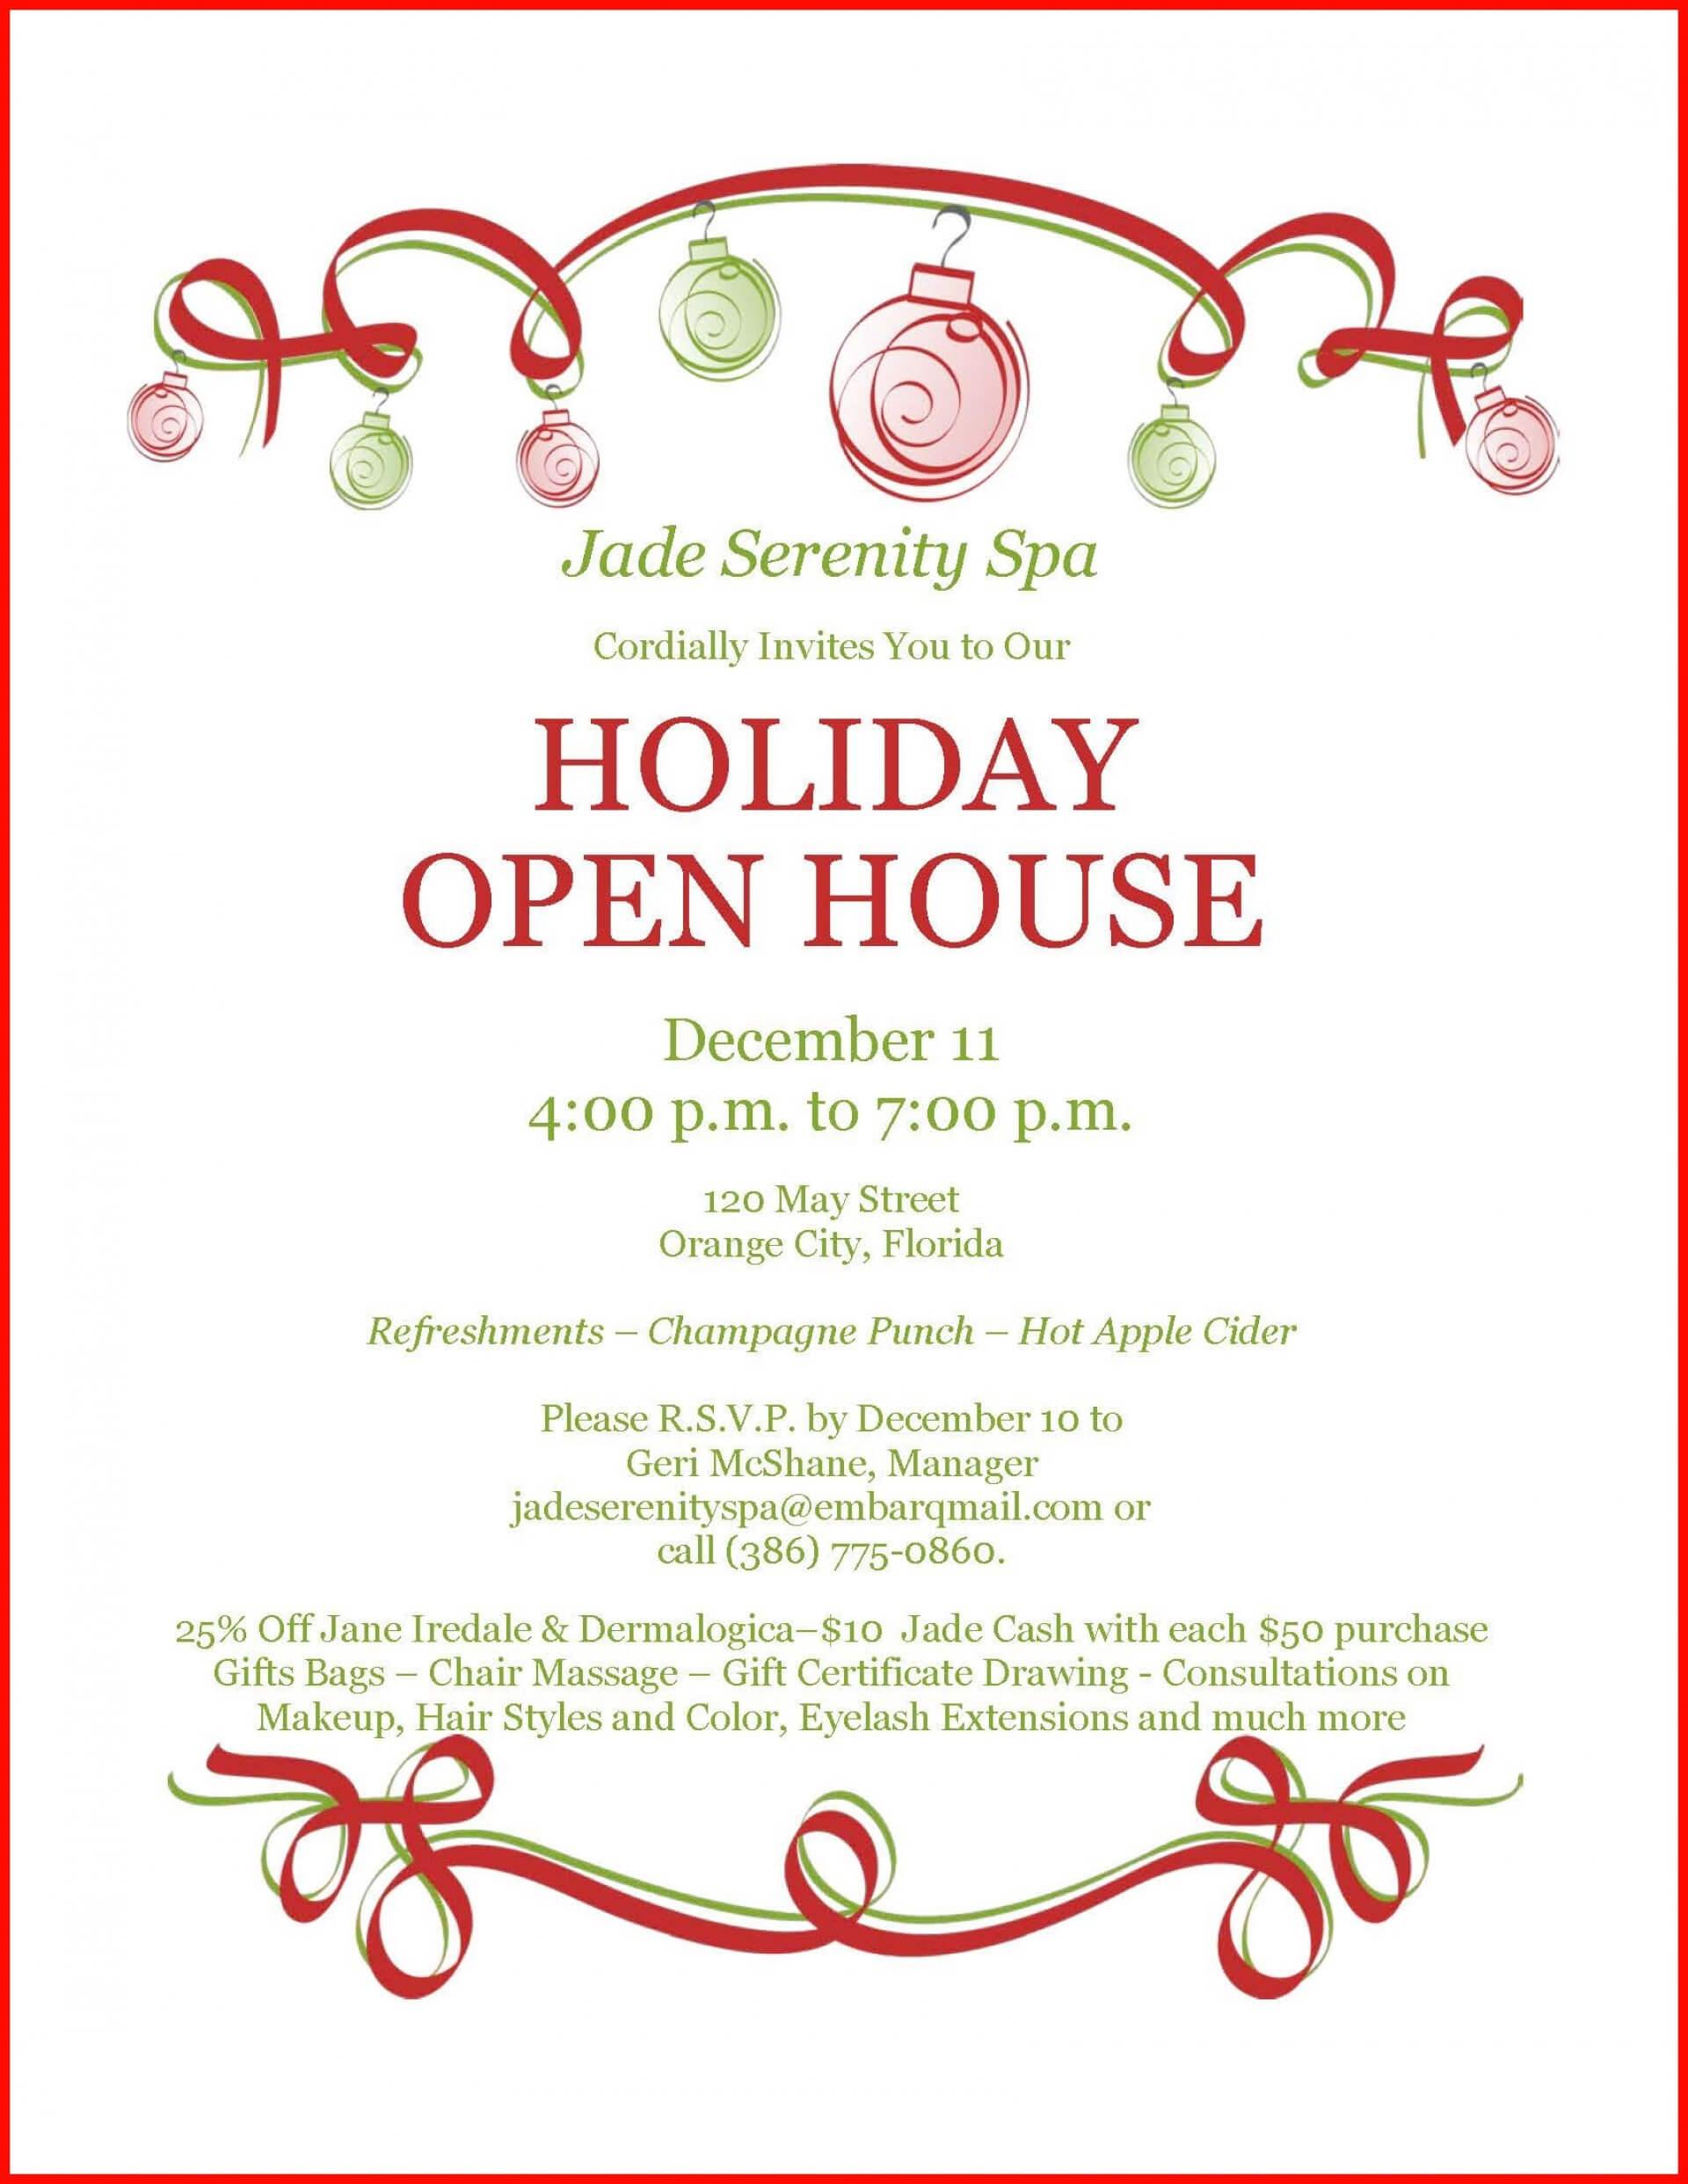 011 Template Ideas Open House Invitation Free 1175713 Pertaining To Business Open House Invitation Templates Free